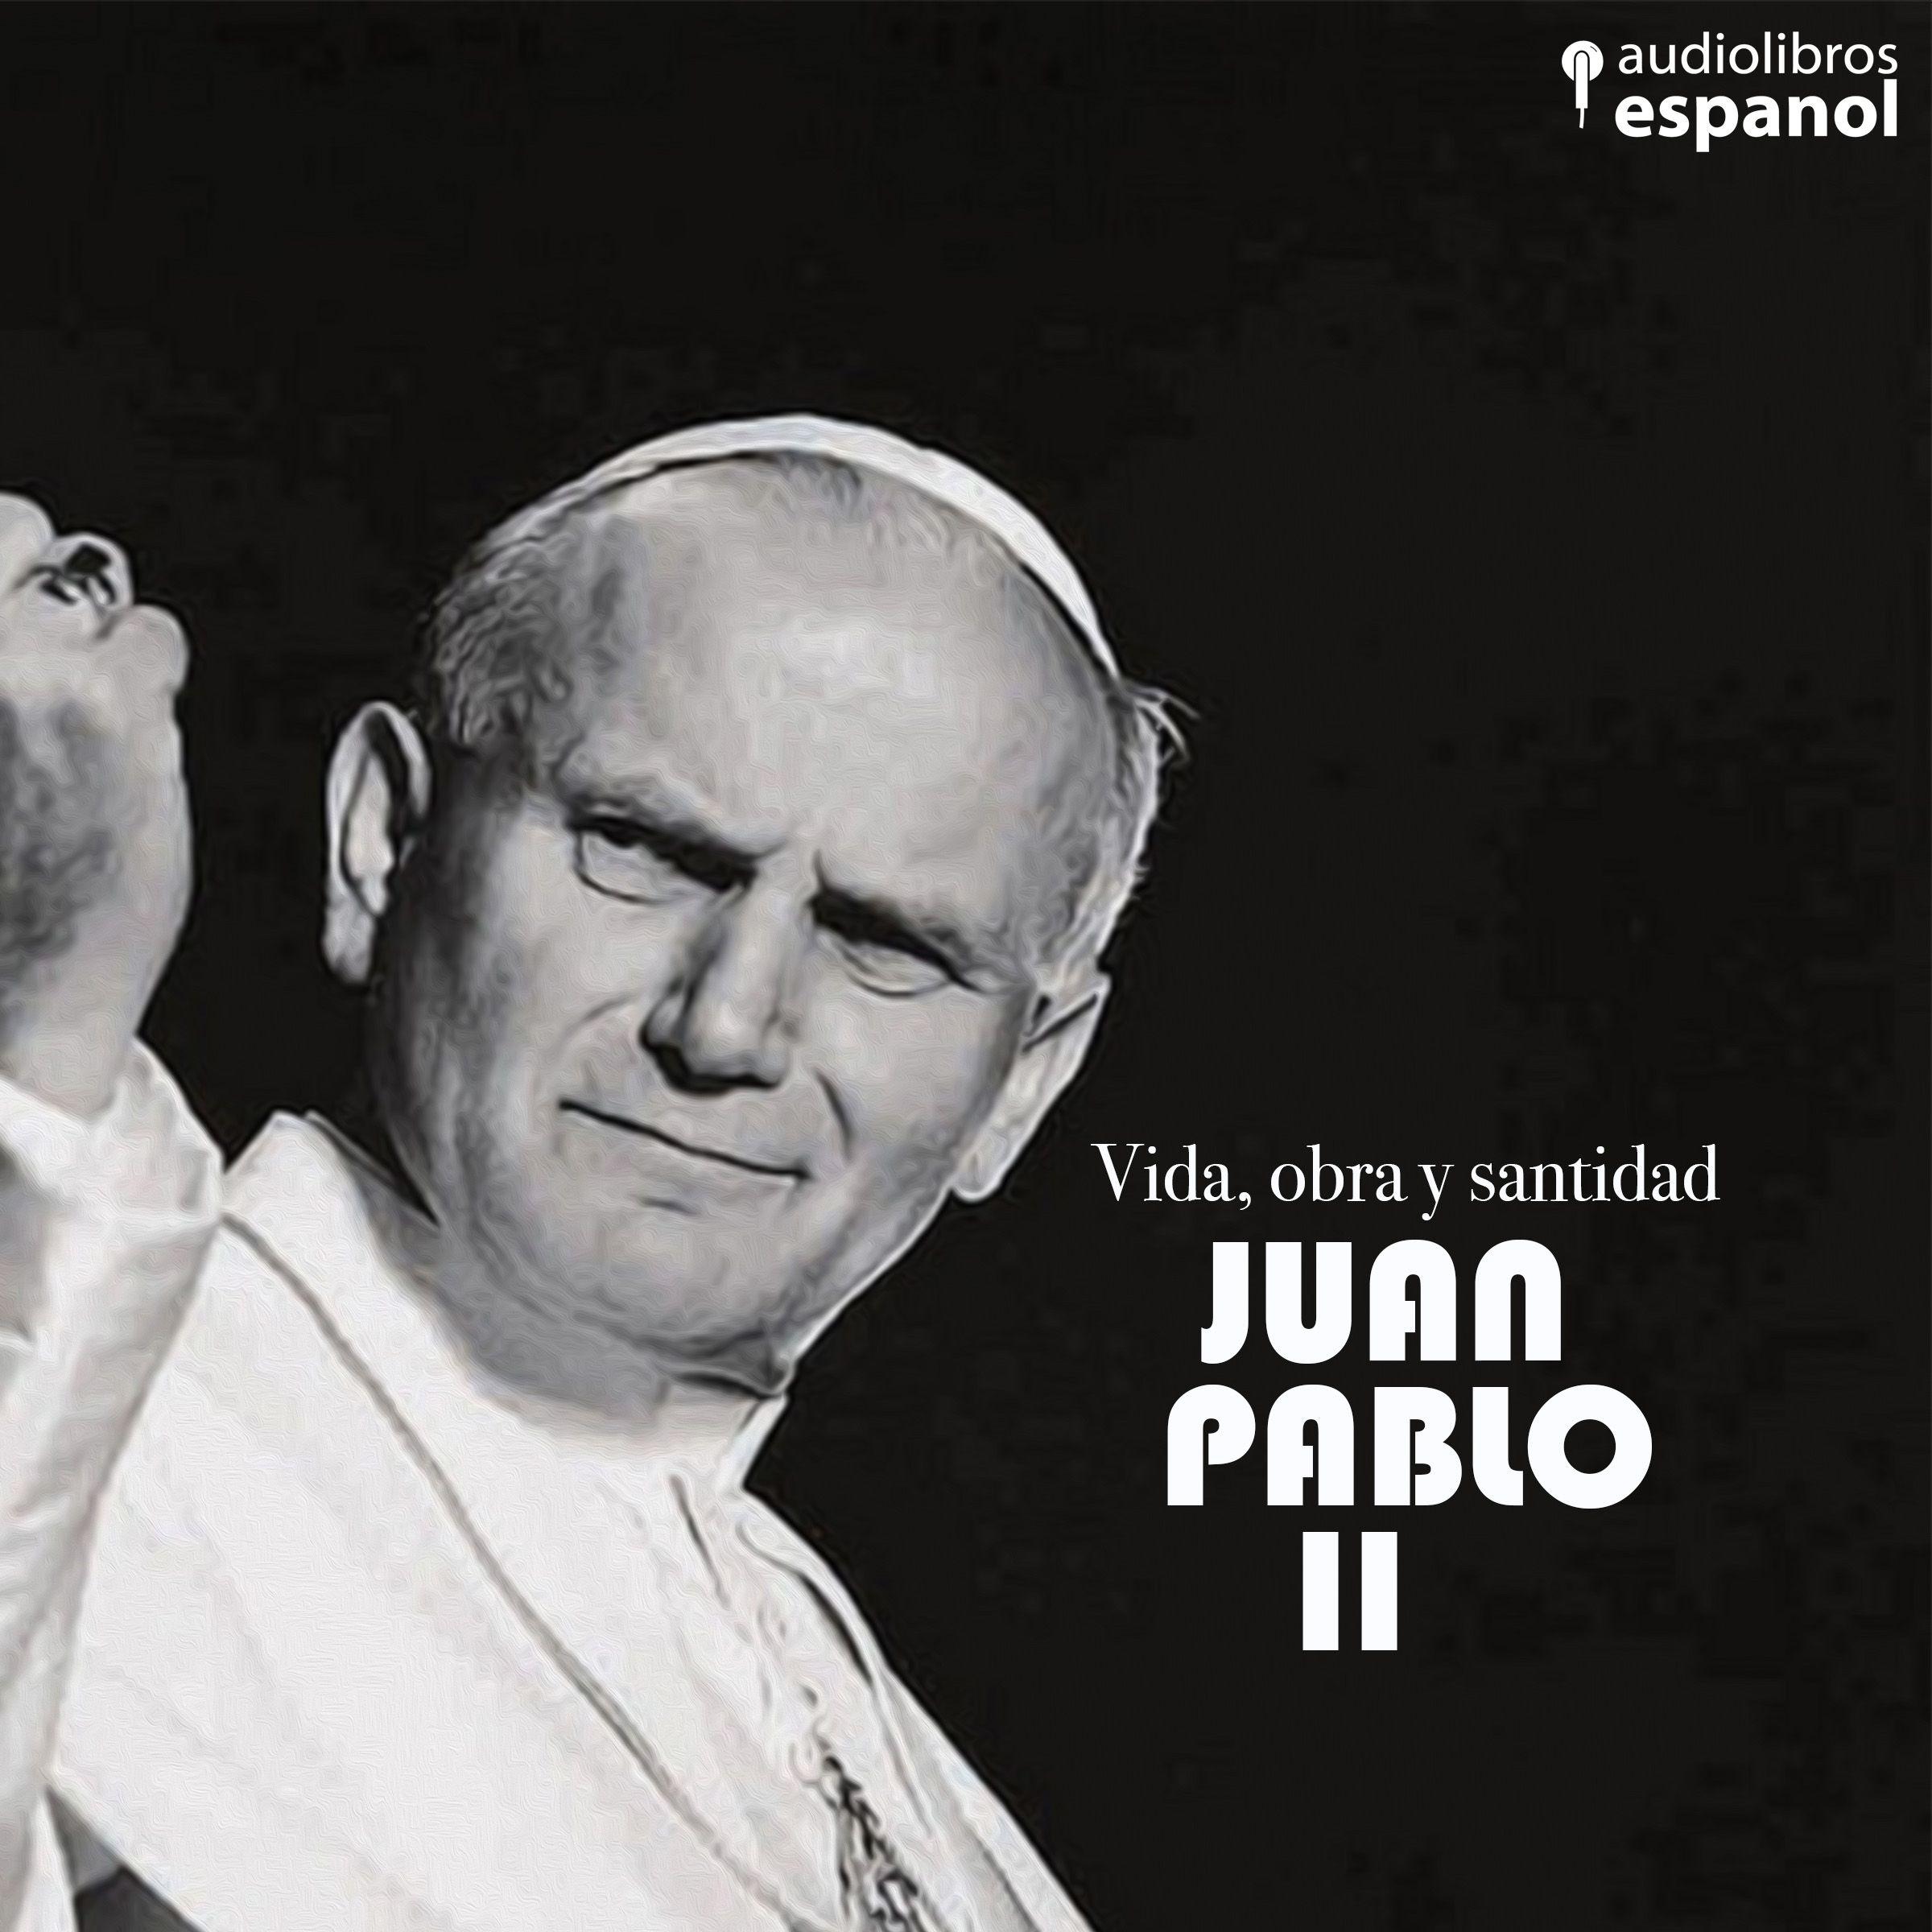 Early life of Pope John Paul II